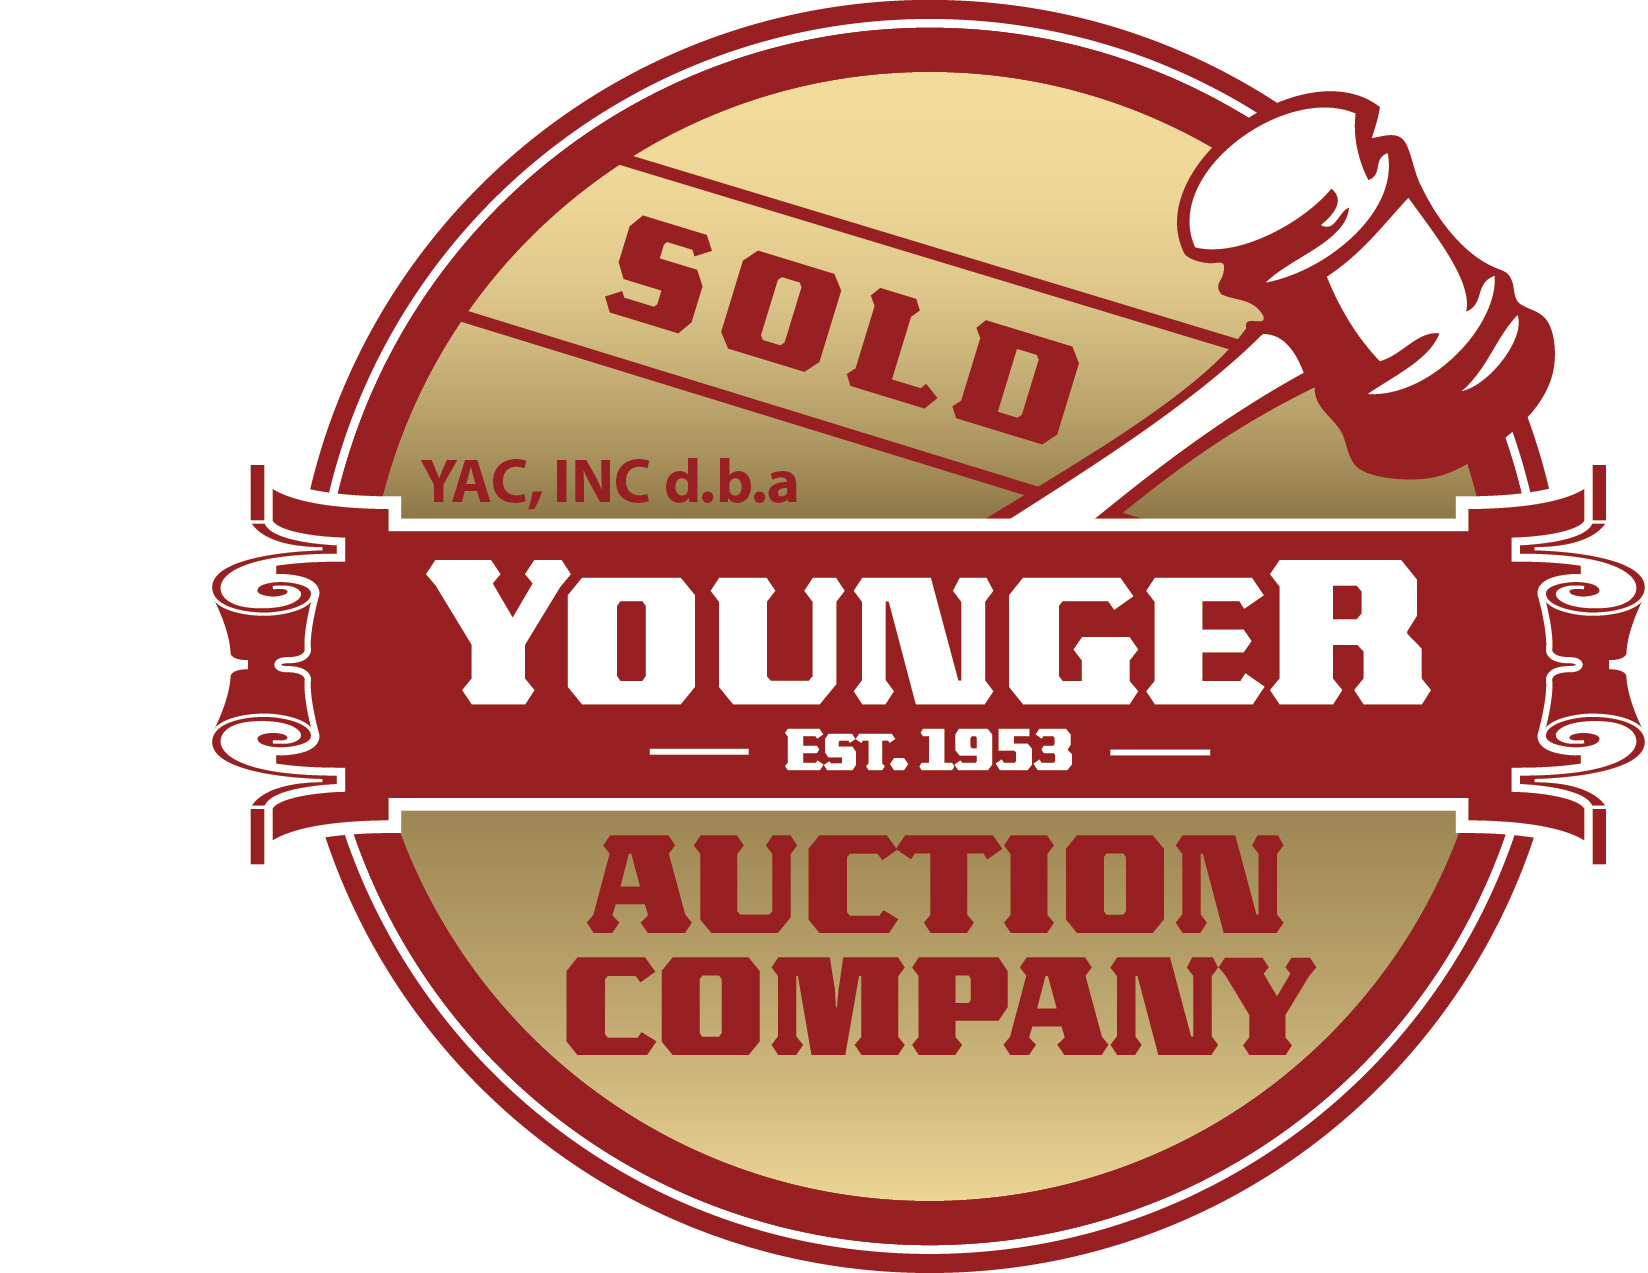 Dean E. Paxson Estate Auction